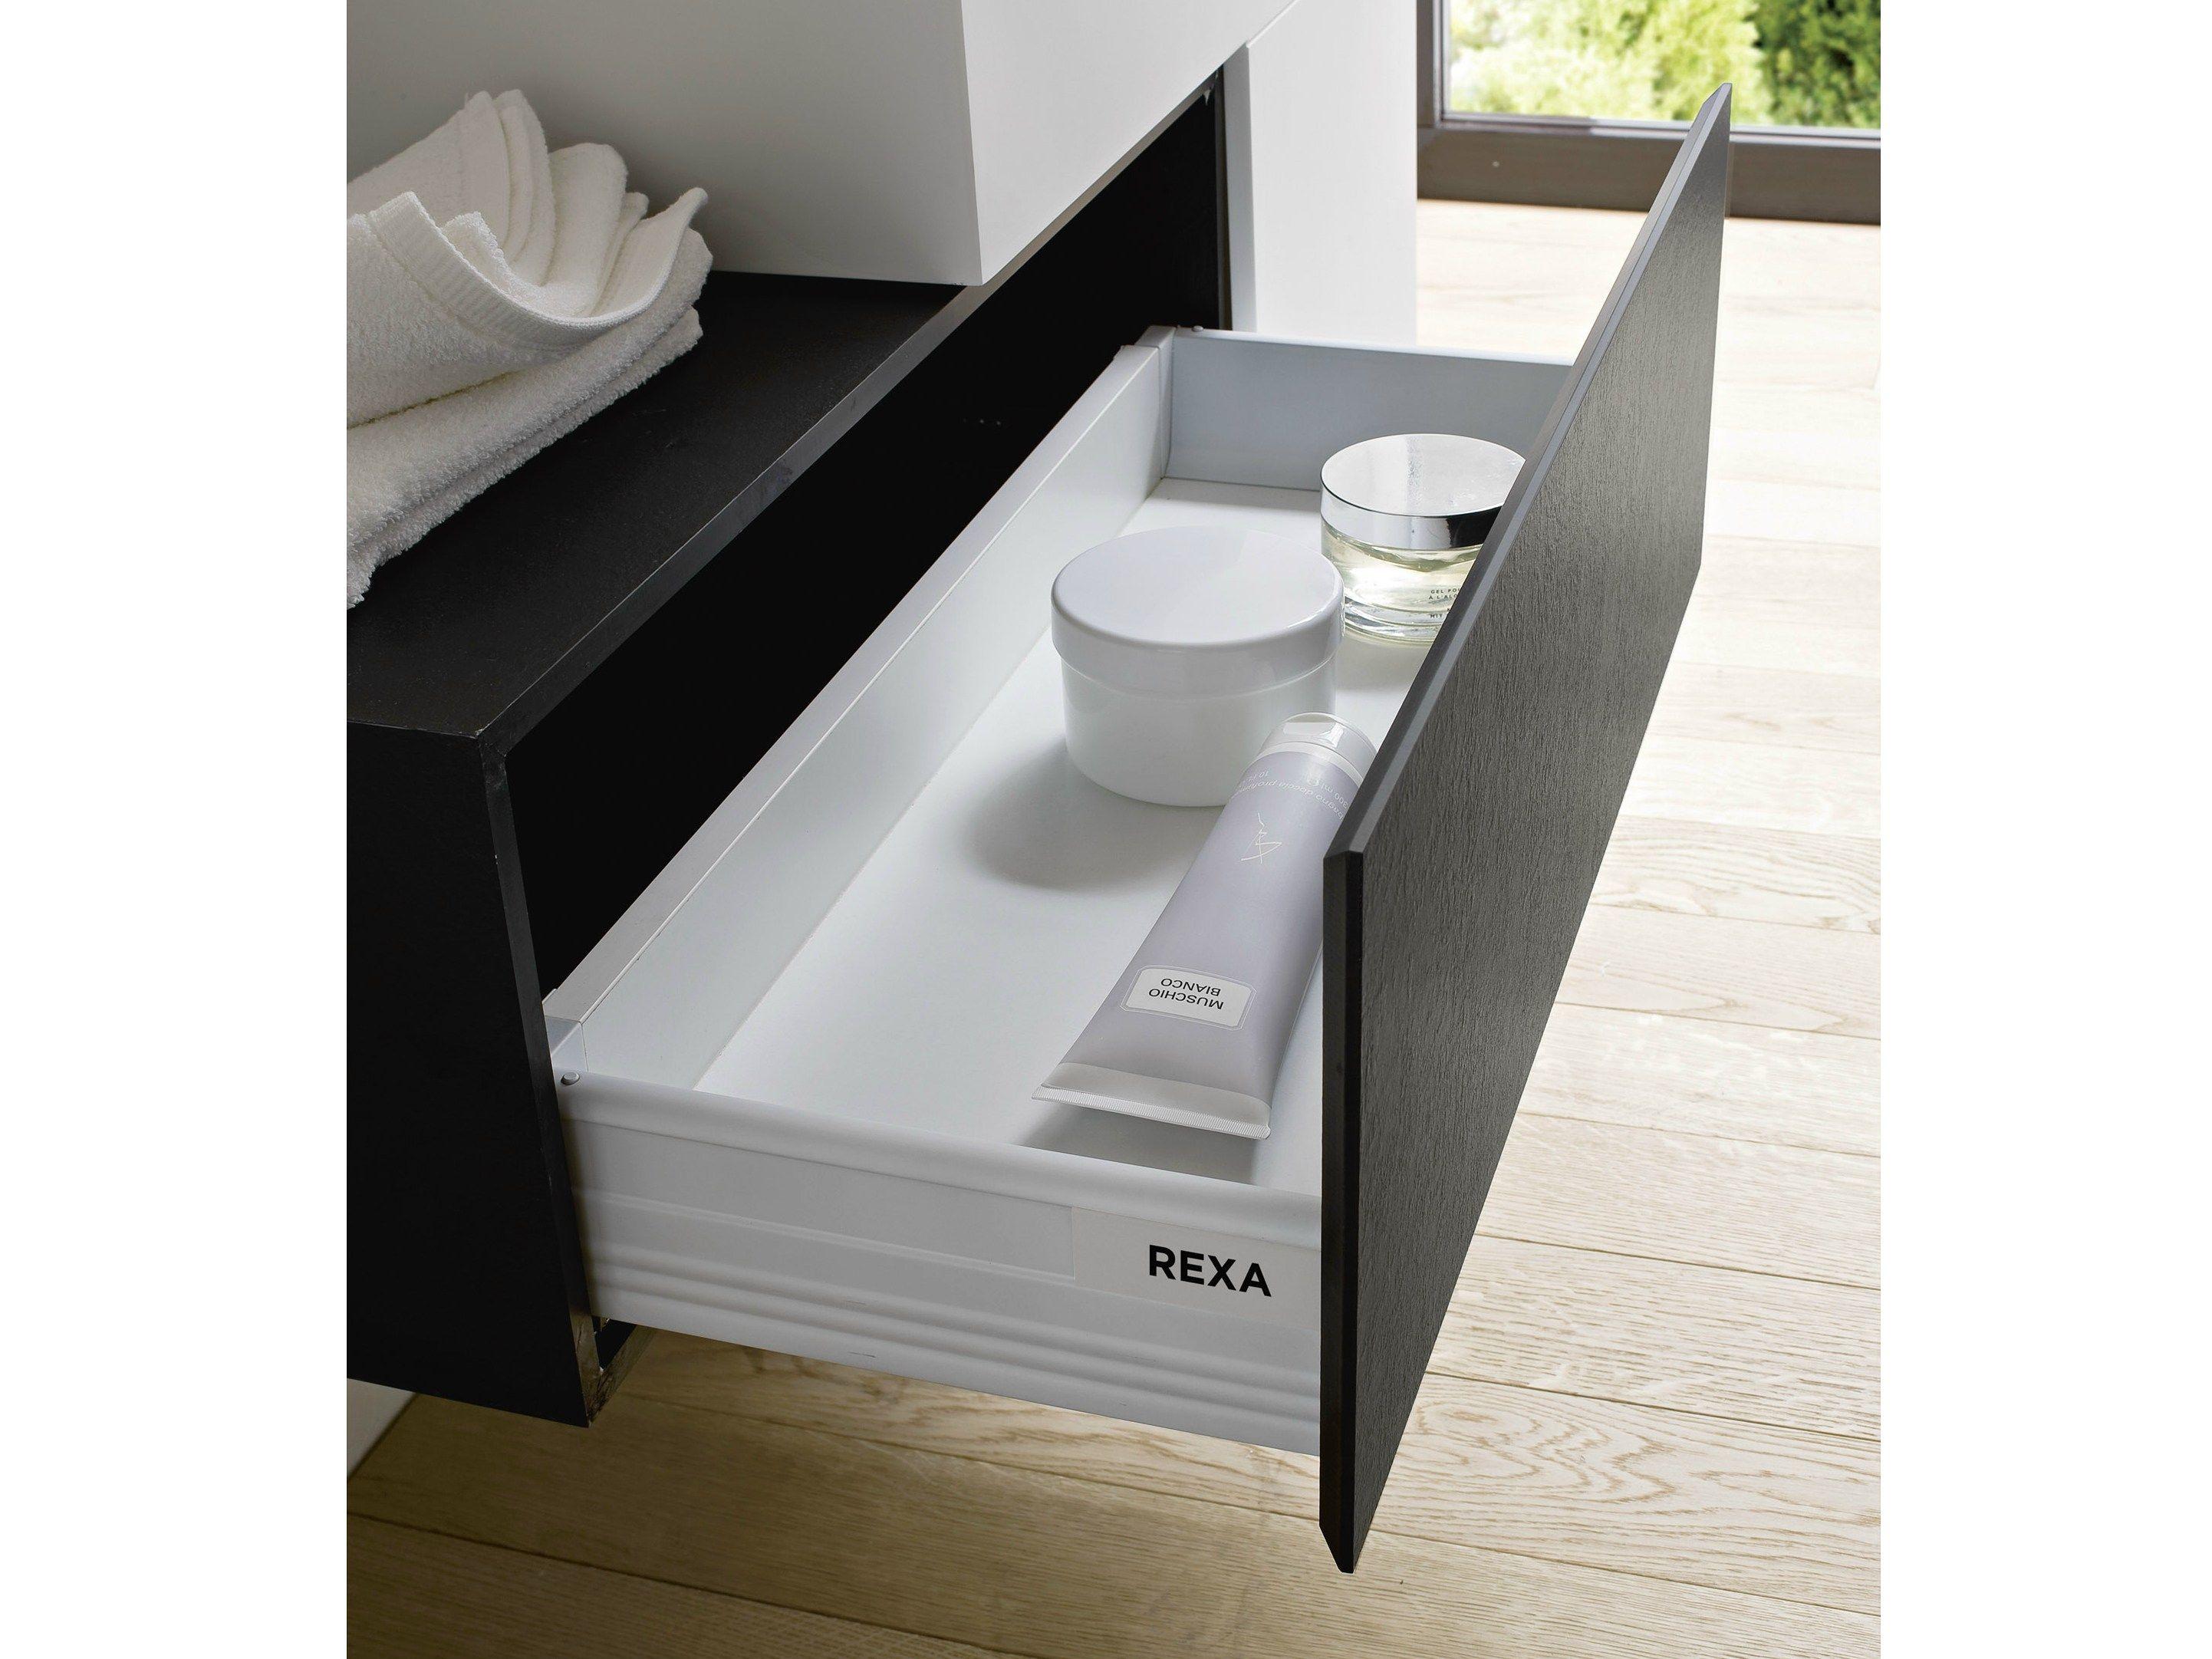 Argo meuble pour salle de bain avec tiroirs by rexa design for Tiroir meuble salle de bain